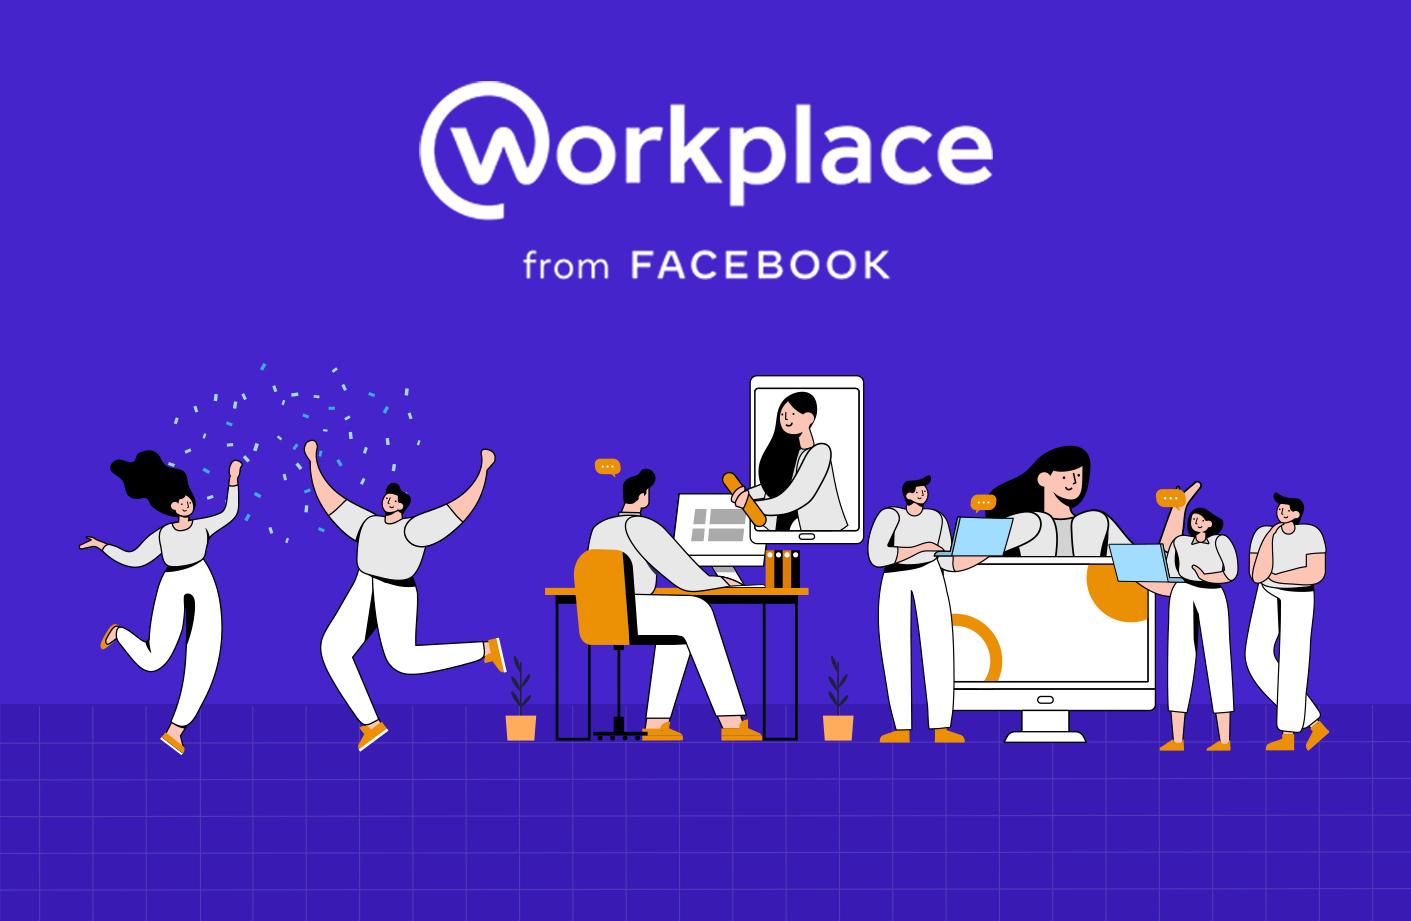 Workplace from Facebook là gì?